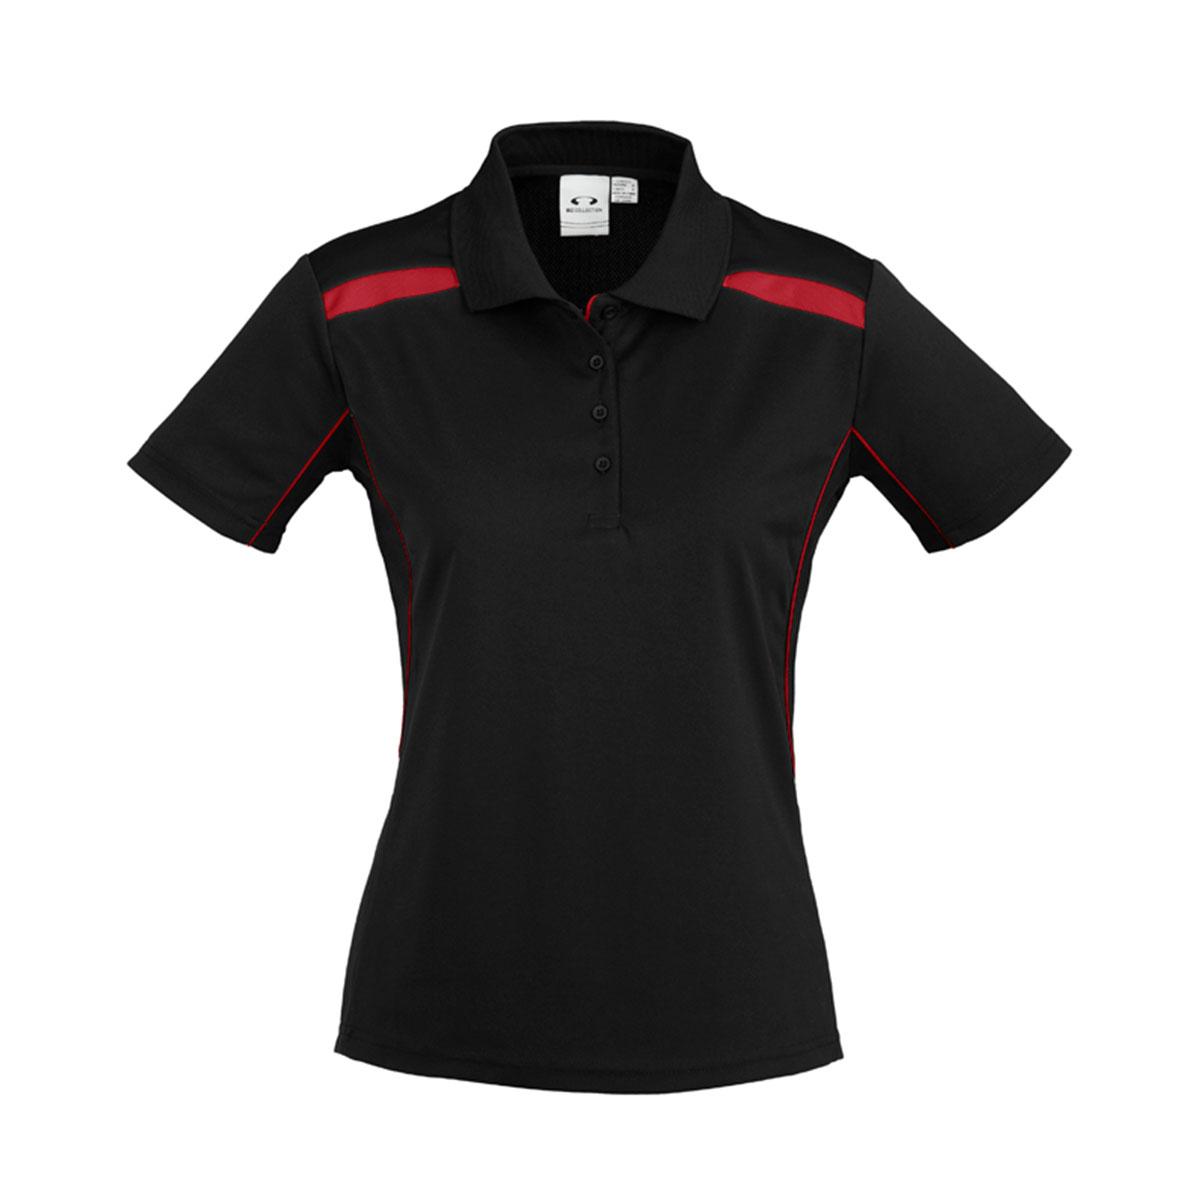 Ladies United Short Sleeve Polo-Black / Red